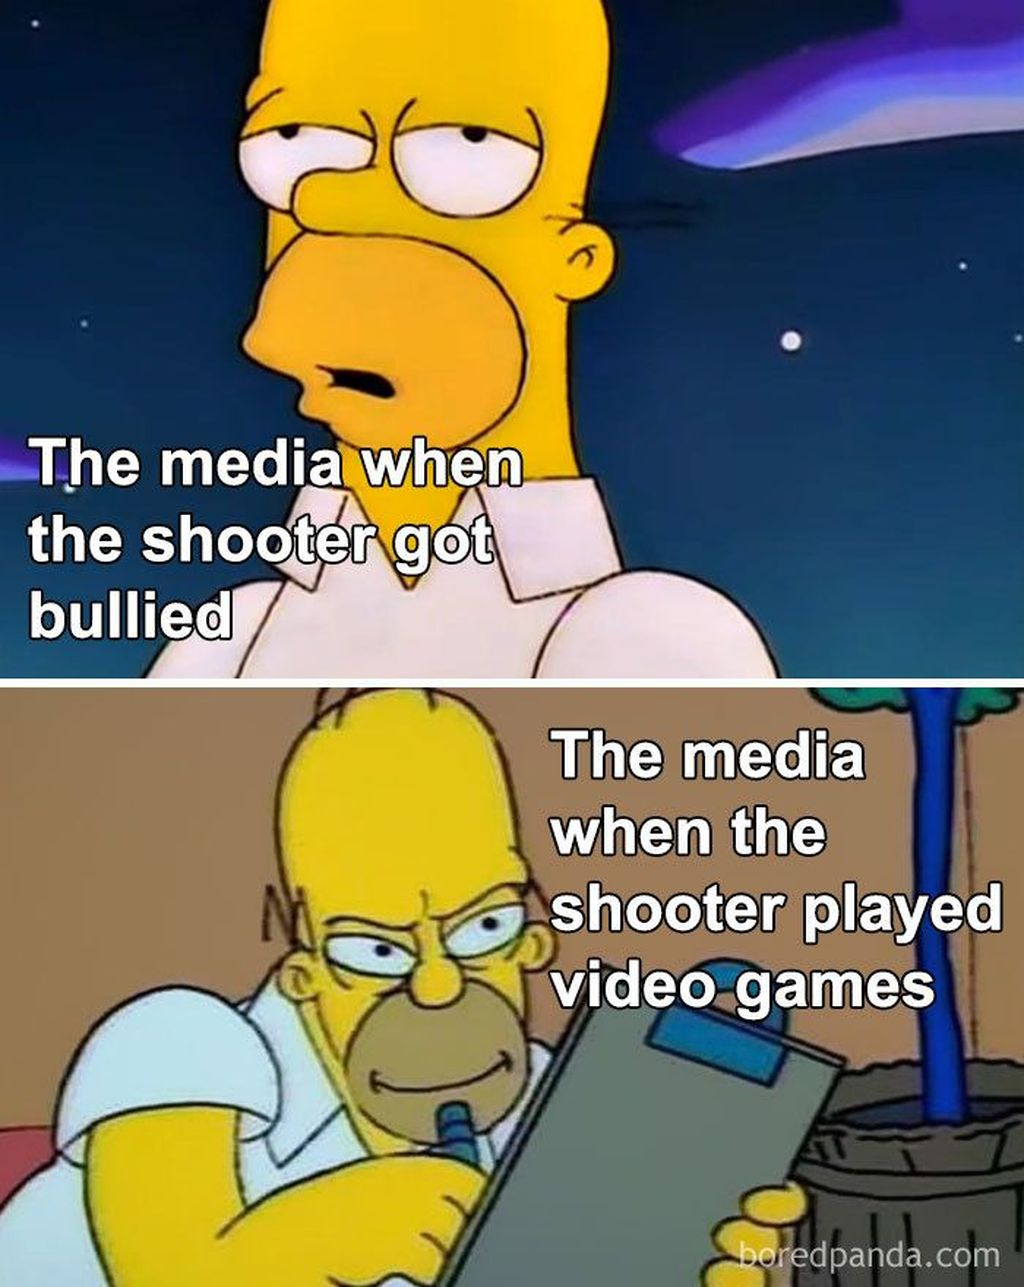 Meme ini menyindir media yang dianggap pilih kasih dalam menyoroti pelaku kekerasan ketika tahuia seorang gamer.(Foto: via Boredpanda.com)